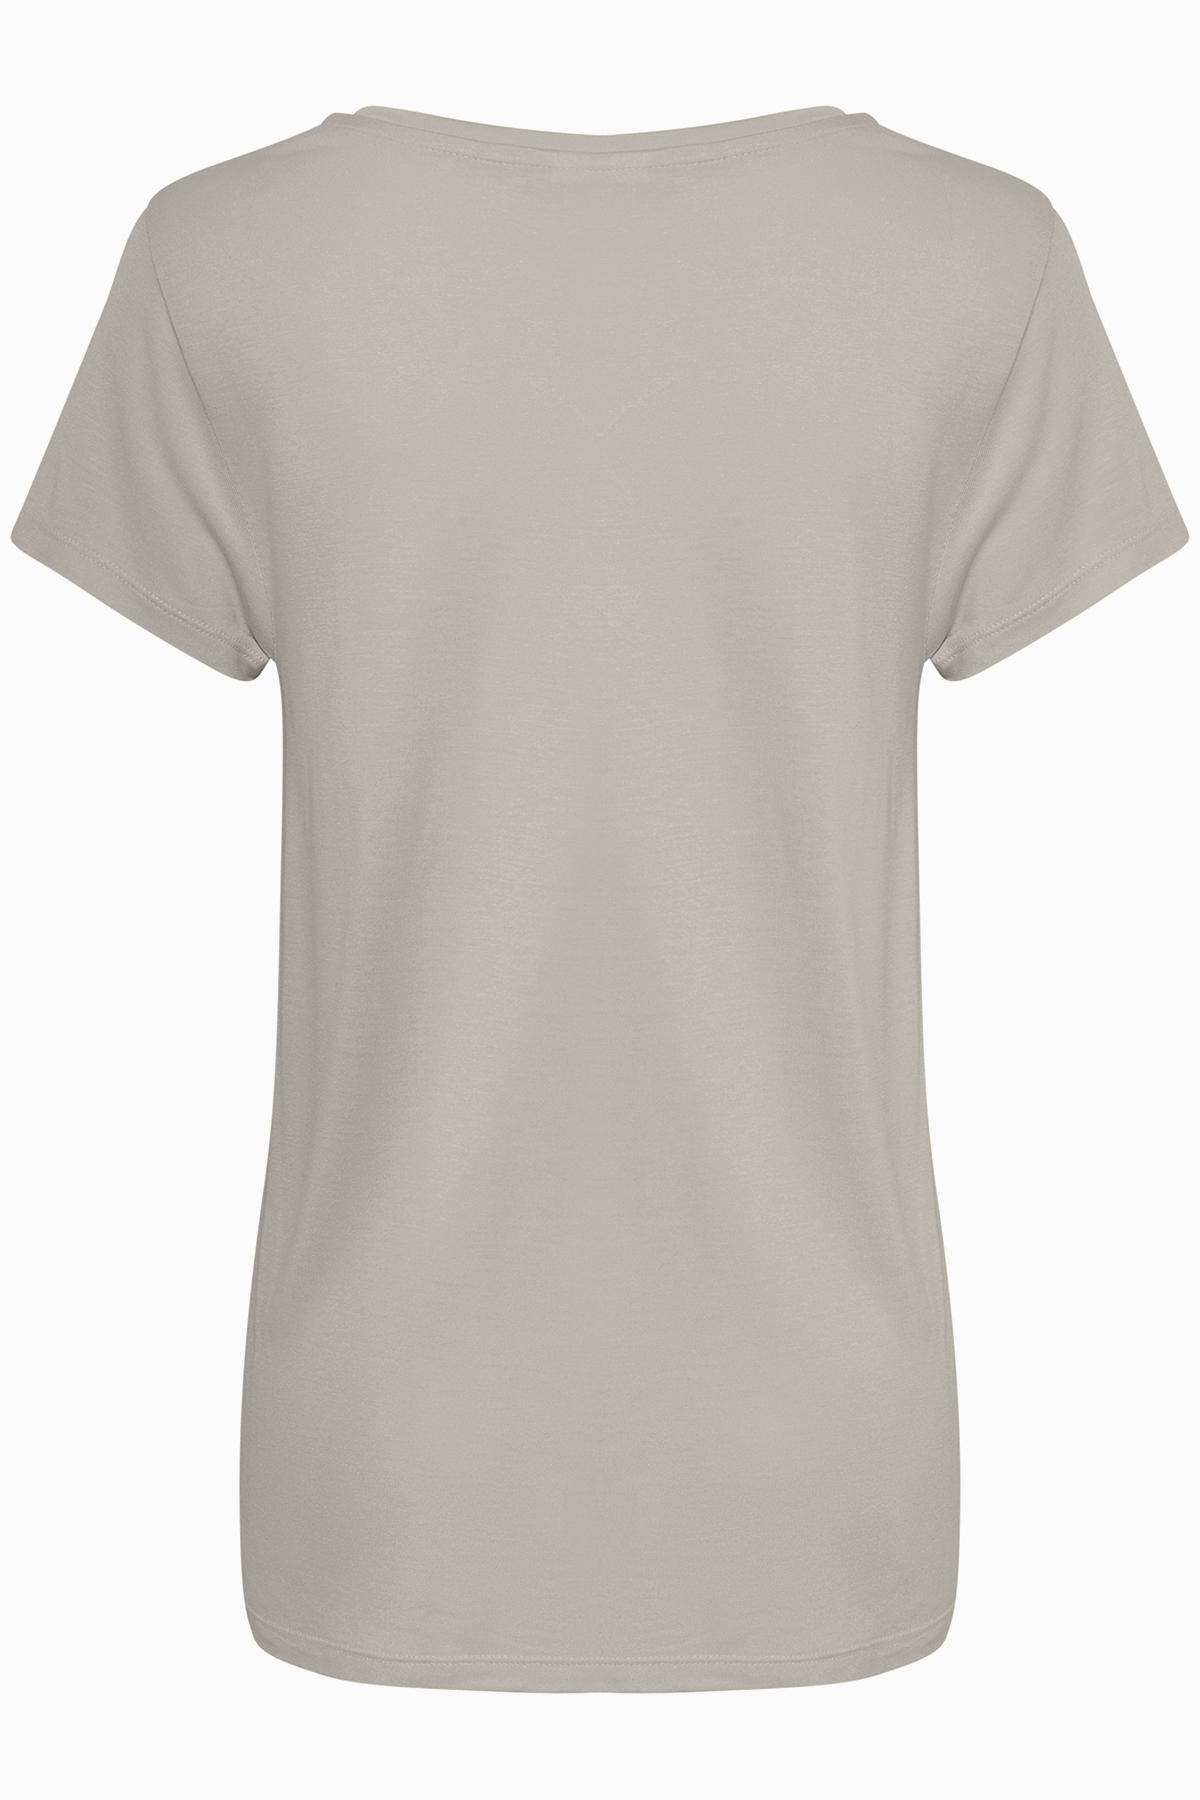 Lys gråmeleret Kortærmet T-shirt fra Kaffe – Køb Lys gråmeleret Kortærmet T-shirt fra str. XS-XXL her